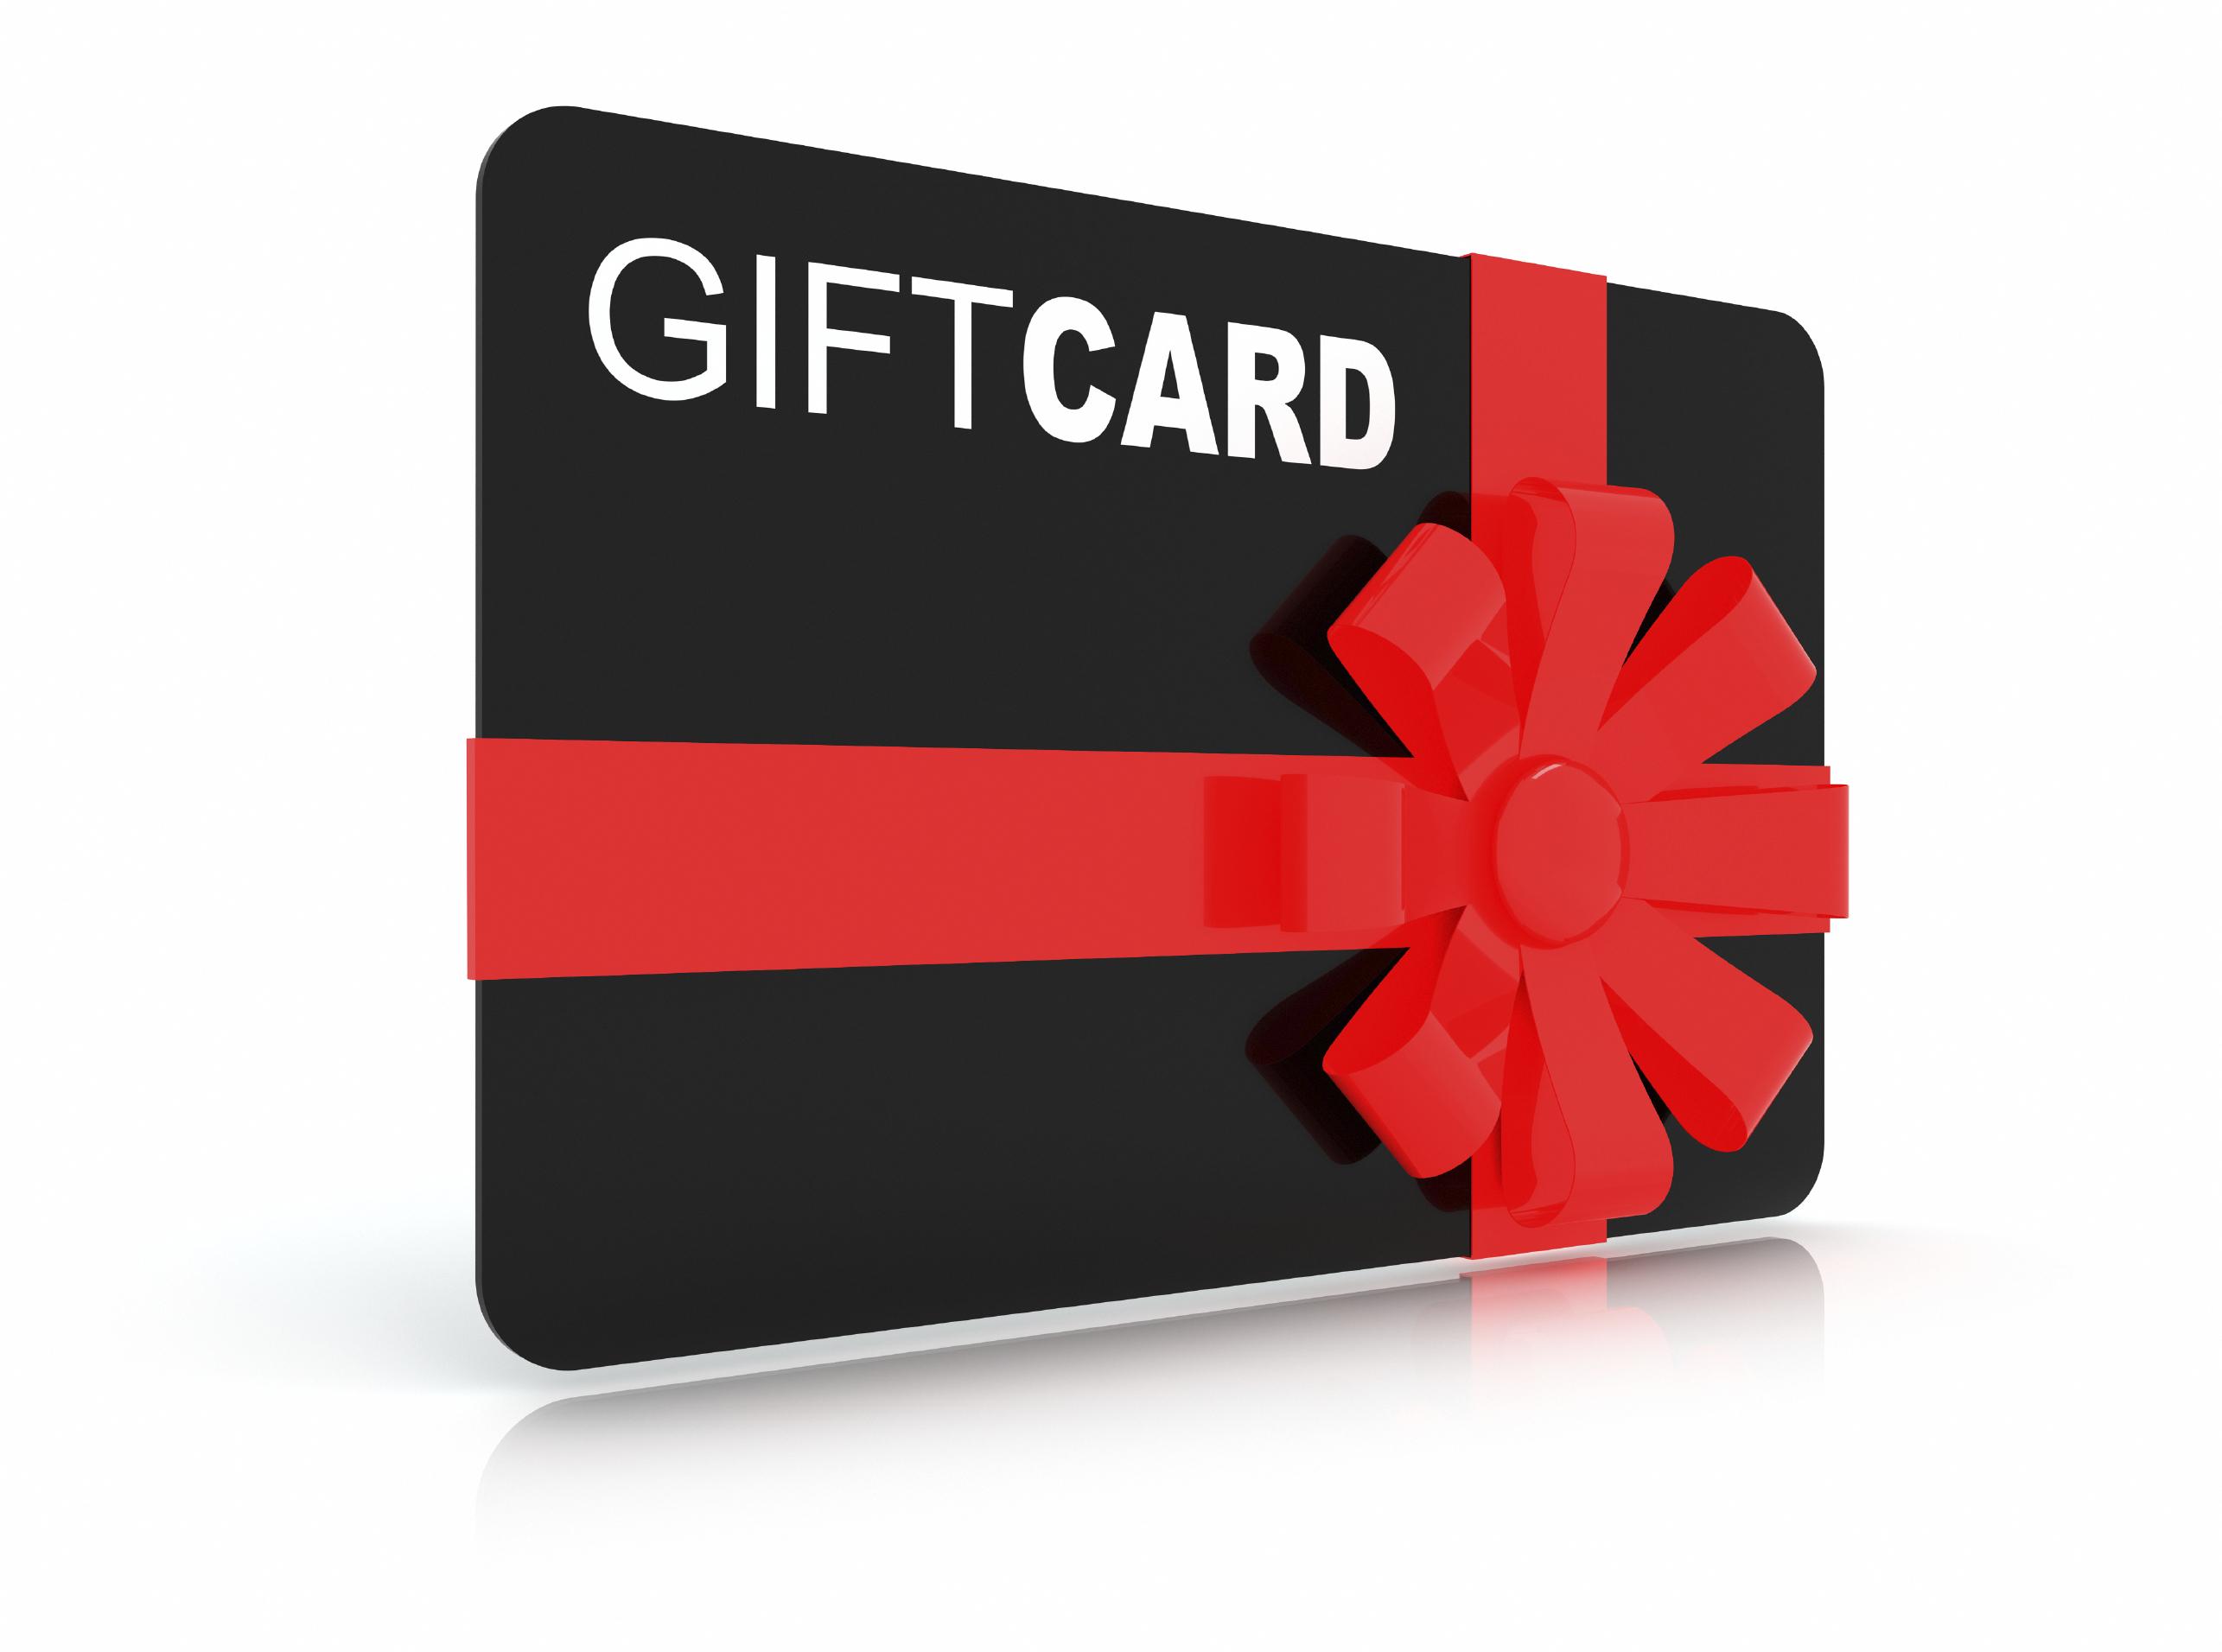 Ikebana Gift Card - $50.00 Image